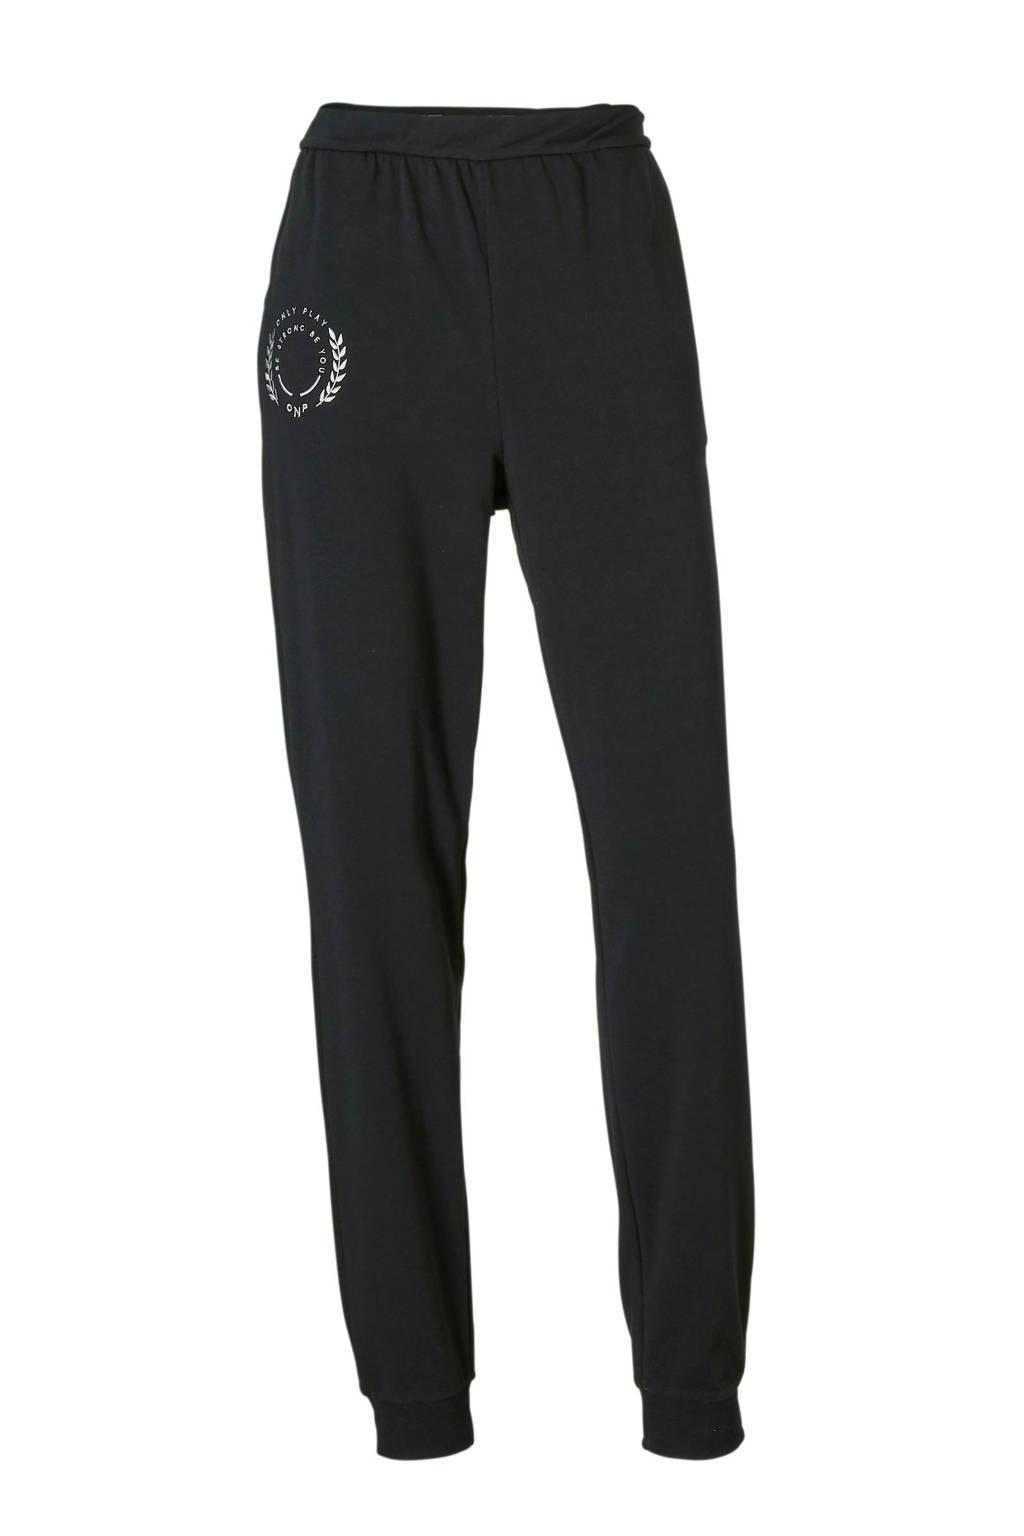 Only Play joggingbroek zwart, Zwart